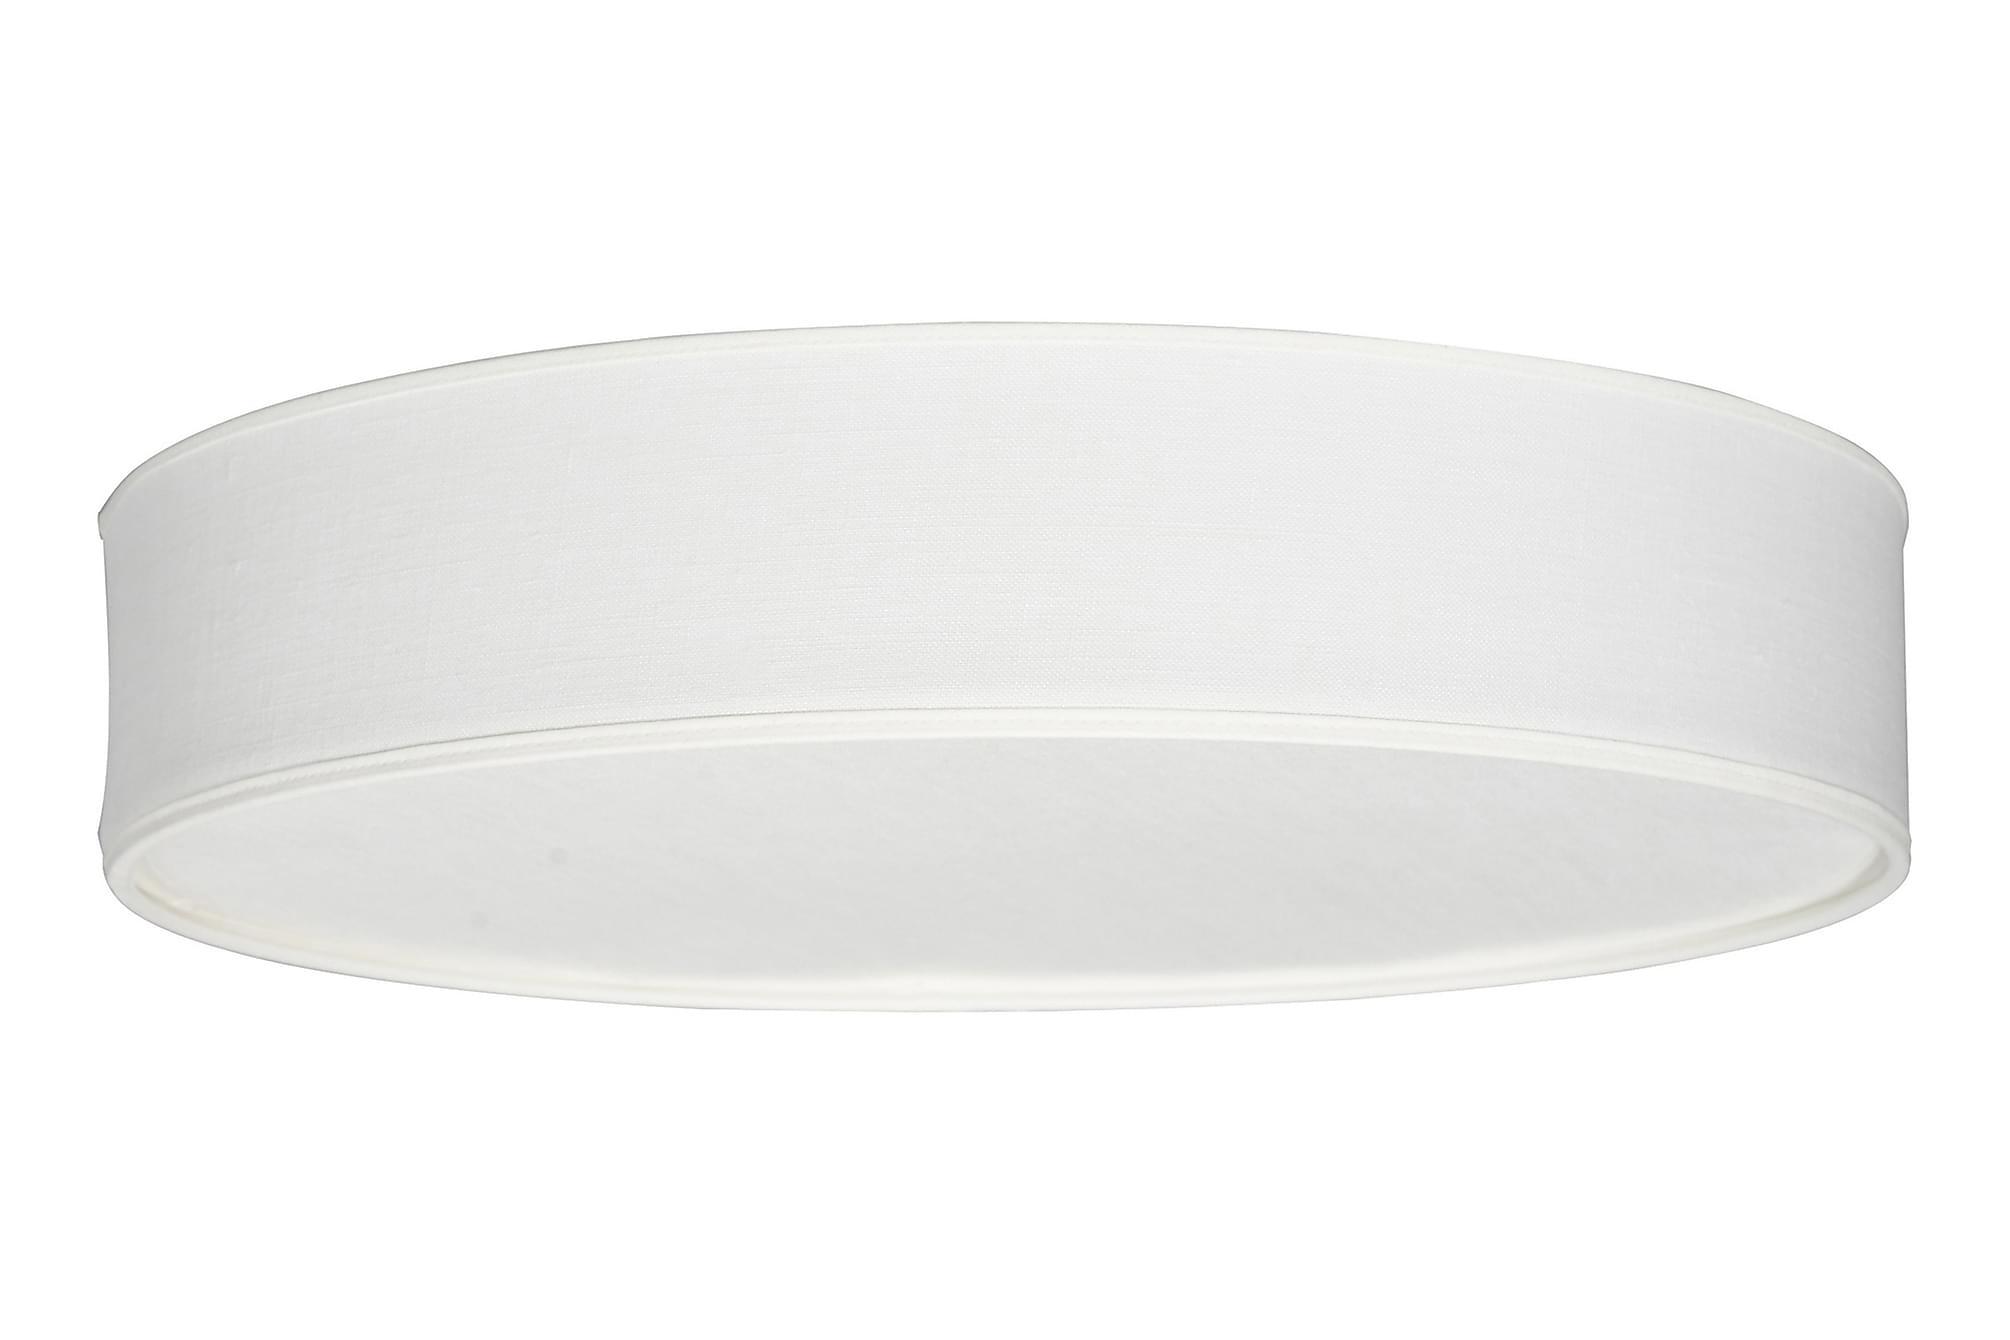 Soft plaf D440 vit linne med akrylbländskydd